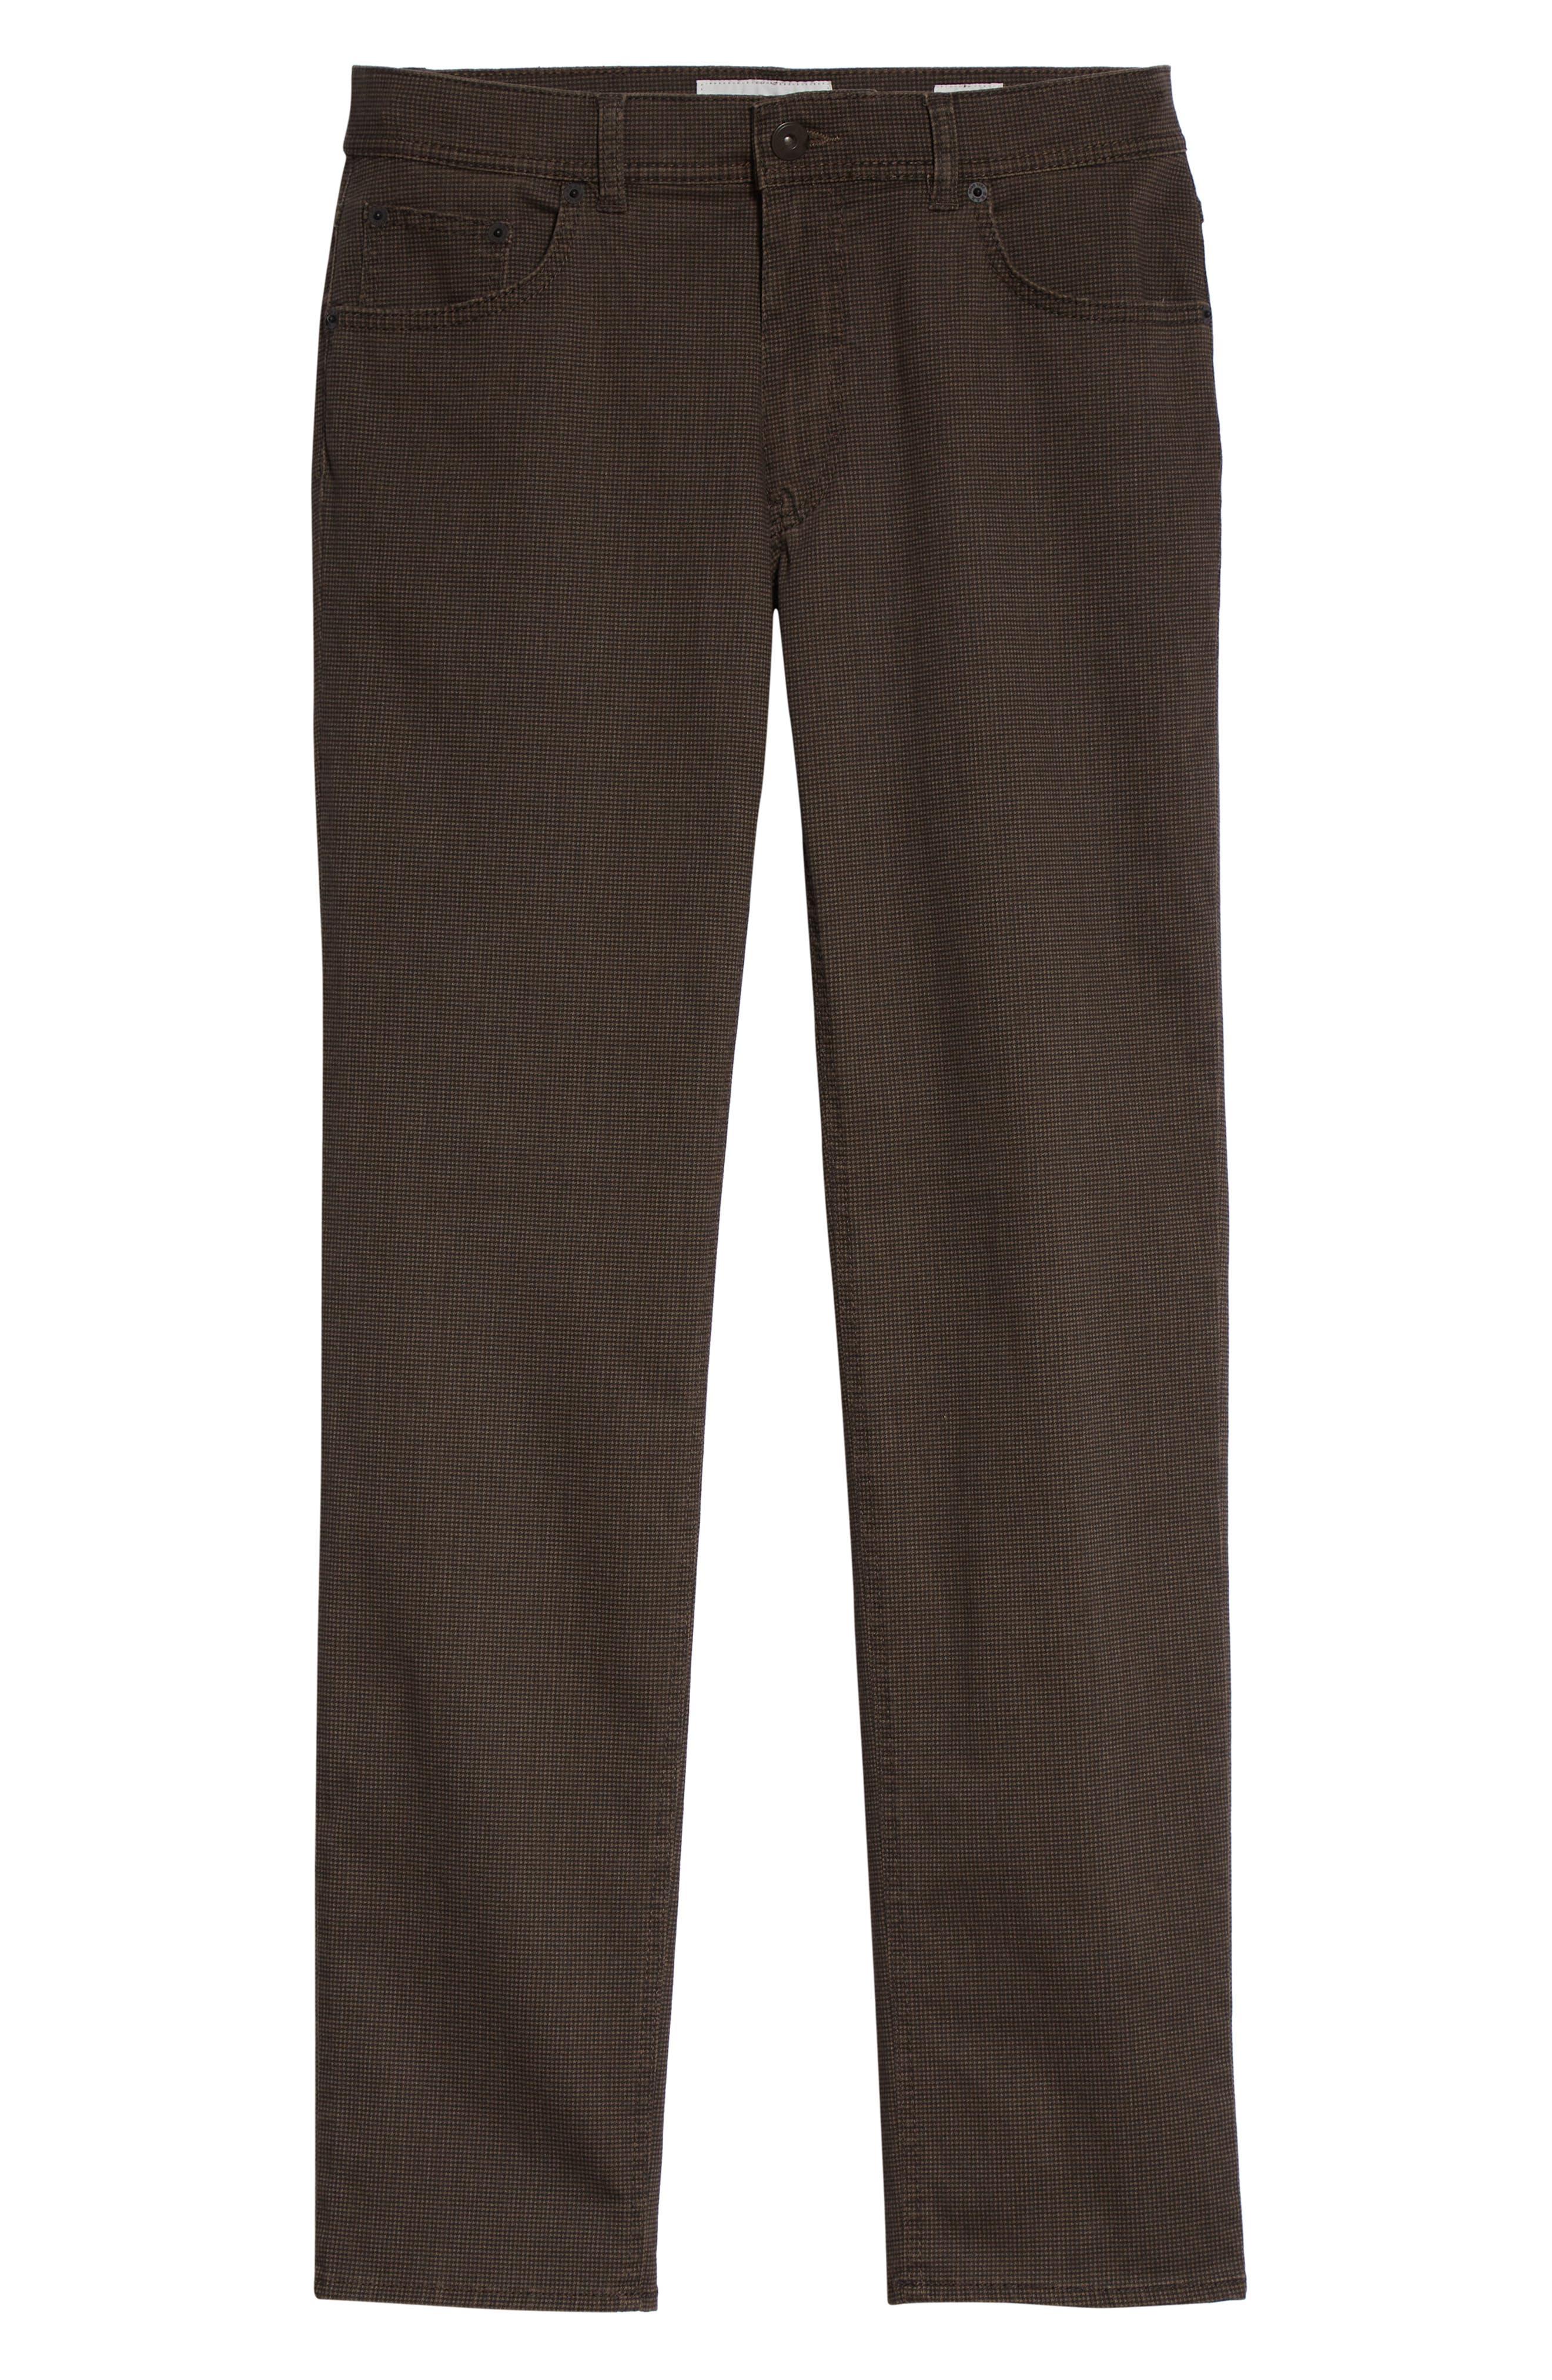 Cooper Fancy Regular Fit Trousers